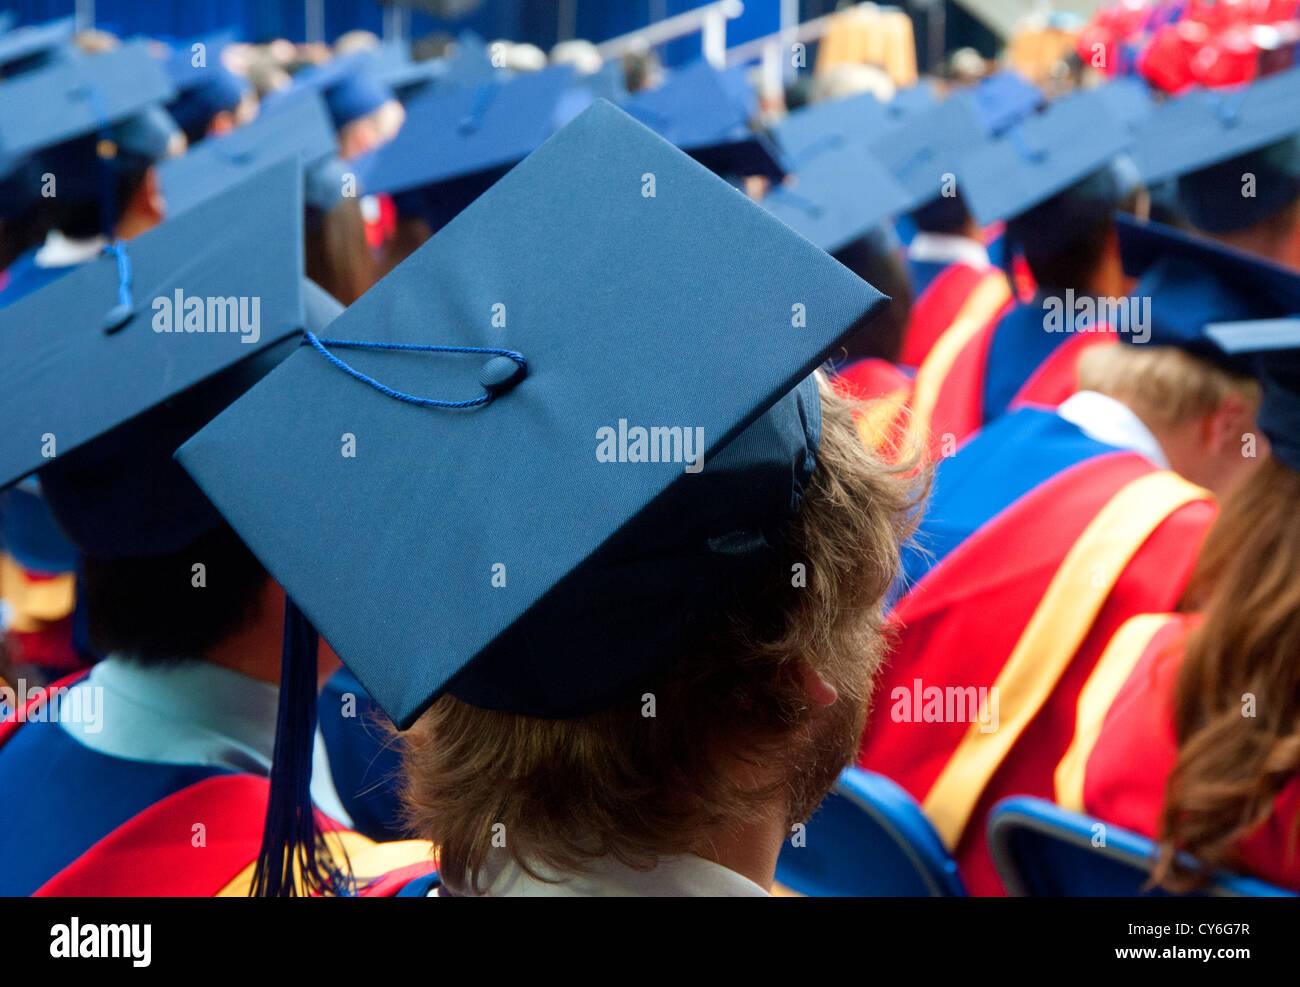 College Graduation Hats Stockfotos & College Graduation Hats Bilder ...